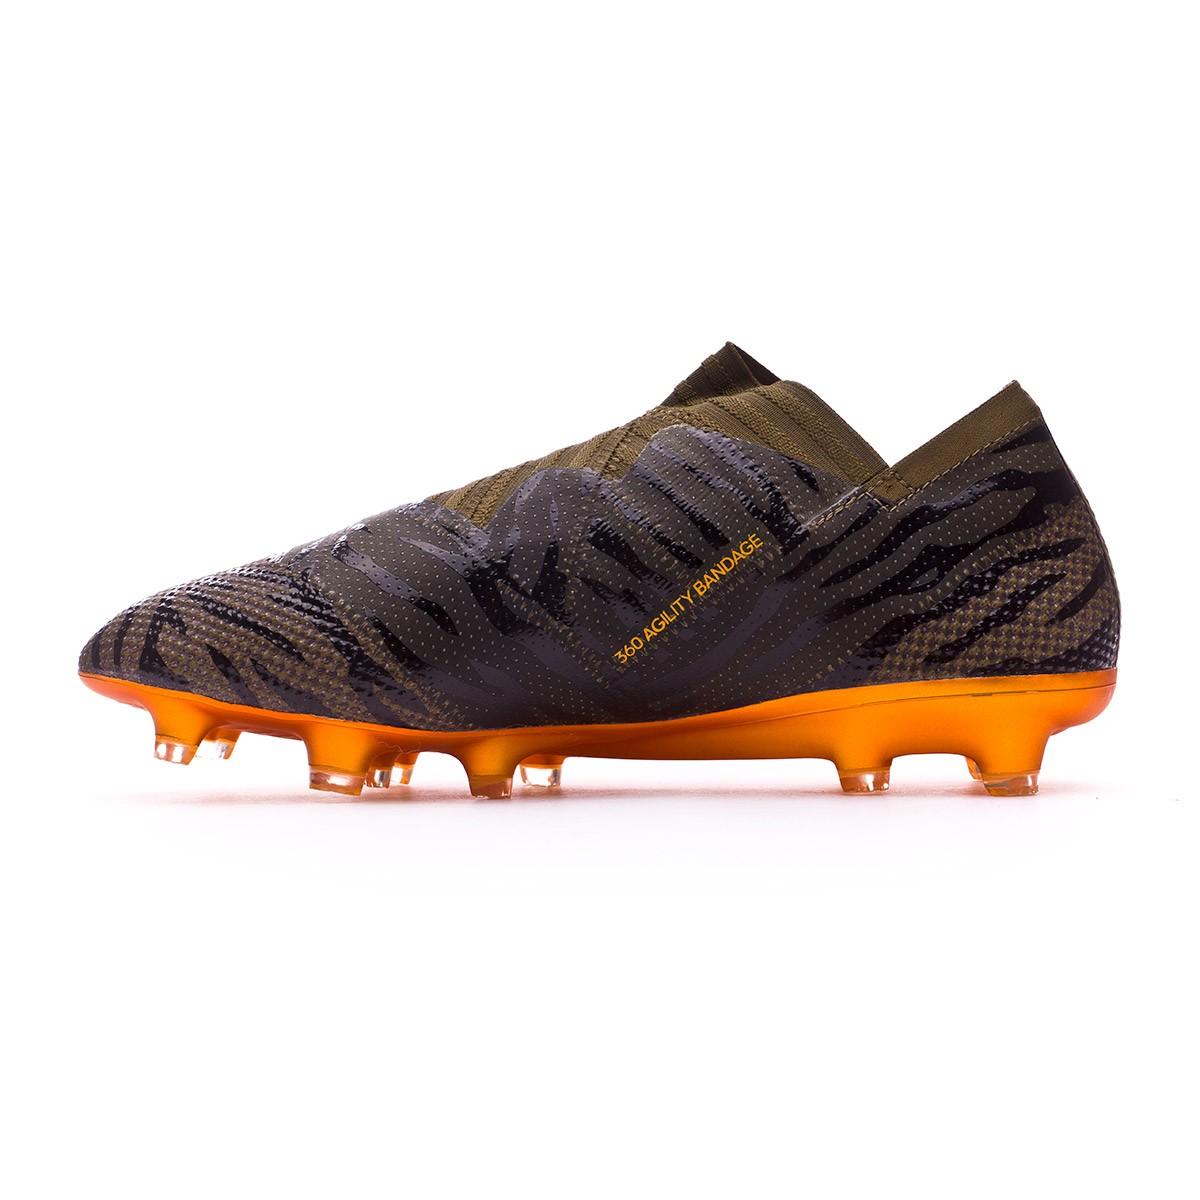 8c585f716f76 Football Boots adidas Nemeziz 17+ 360 Agility FG Trace olive-Bright  orange-Core black - Tienda de fútbol Fútbol Emotion